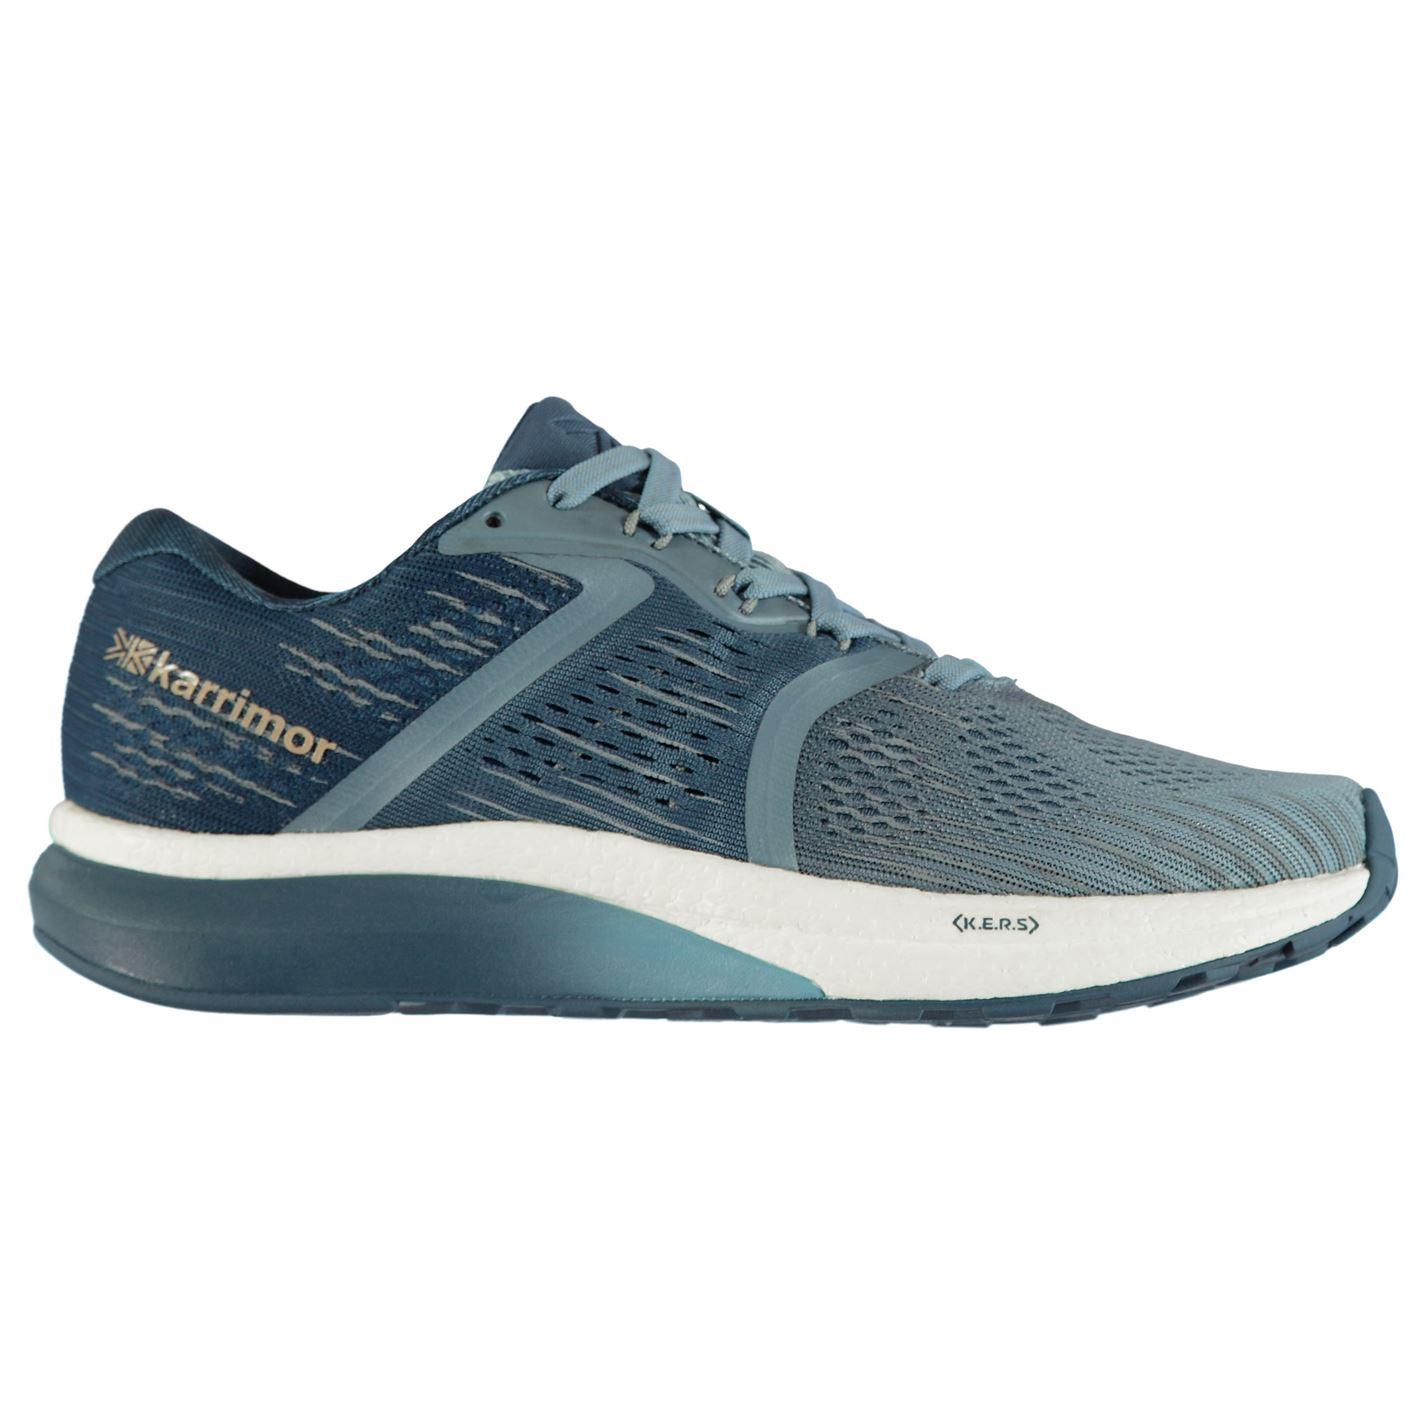 Karrimor Excel 3 Ld91 dámske bežecké topánky